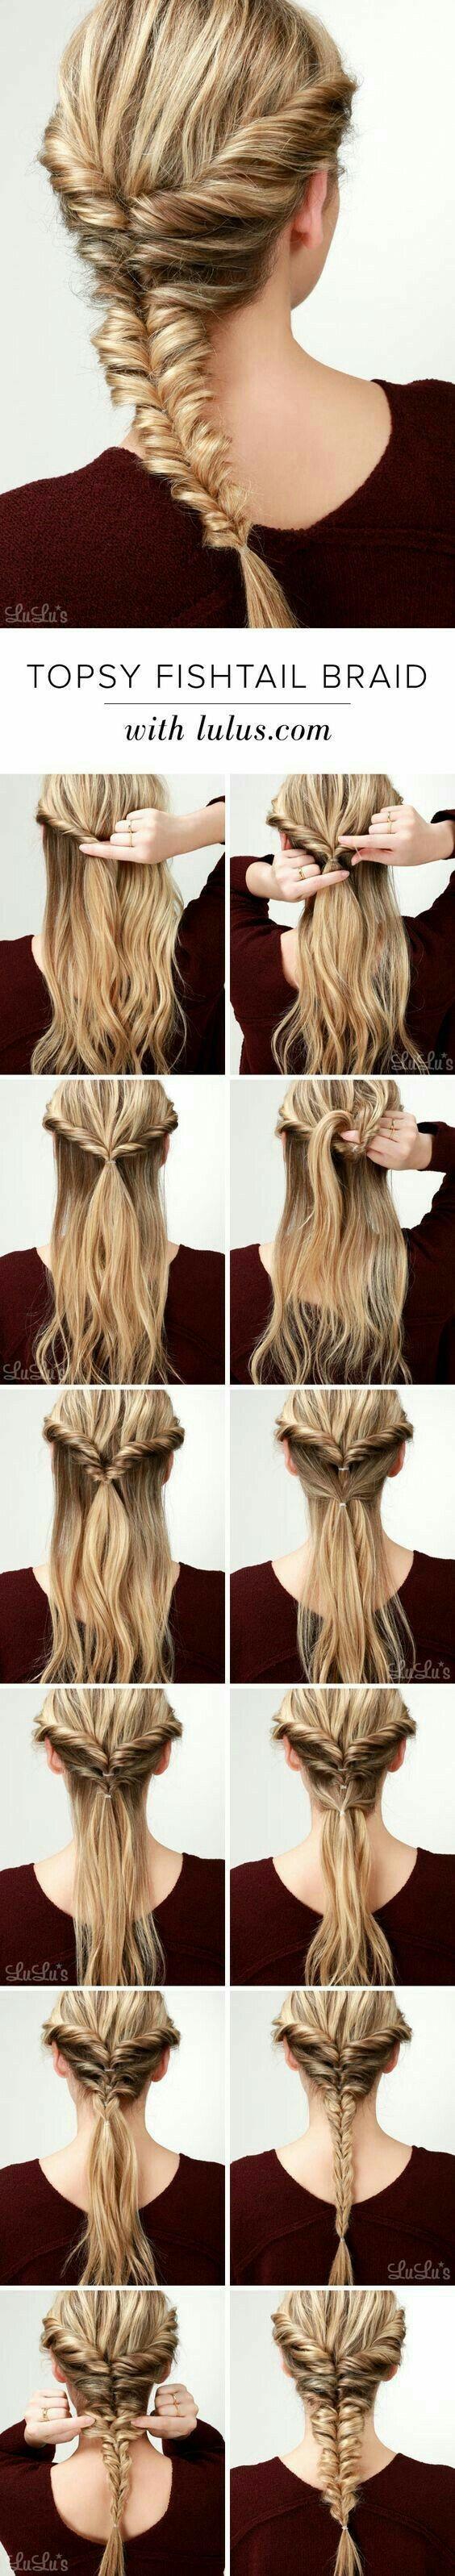 Beautiful hairstyles braids best models summer New Hairdressing